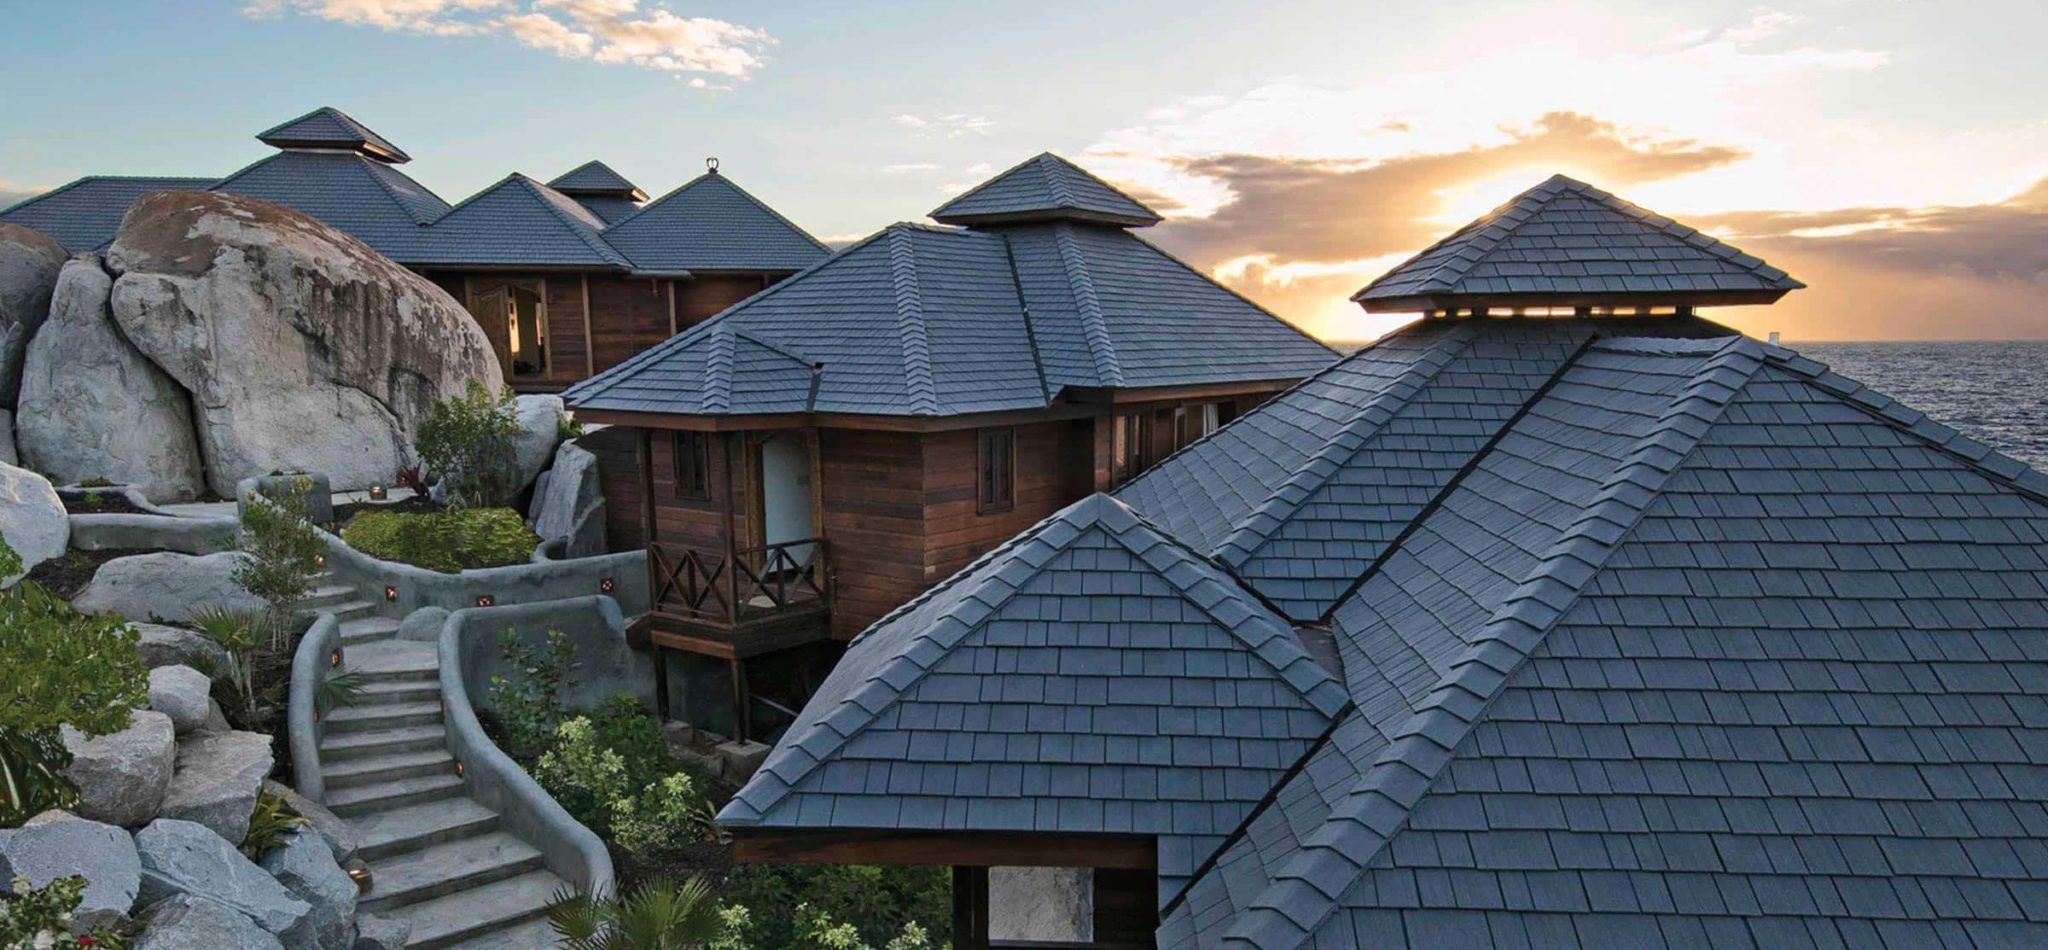 the batu villa at sunset